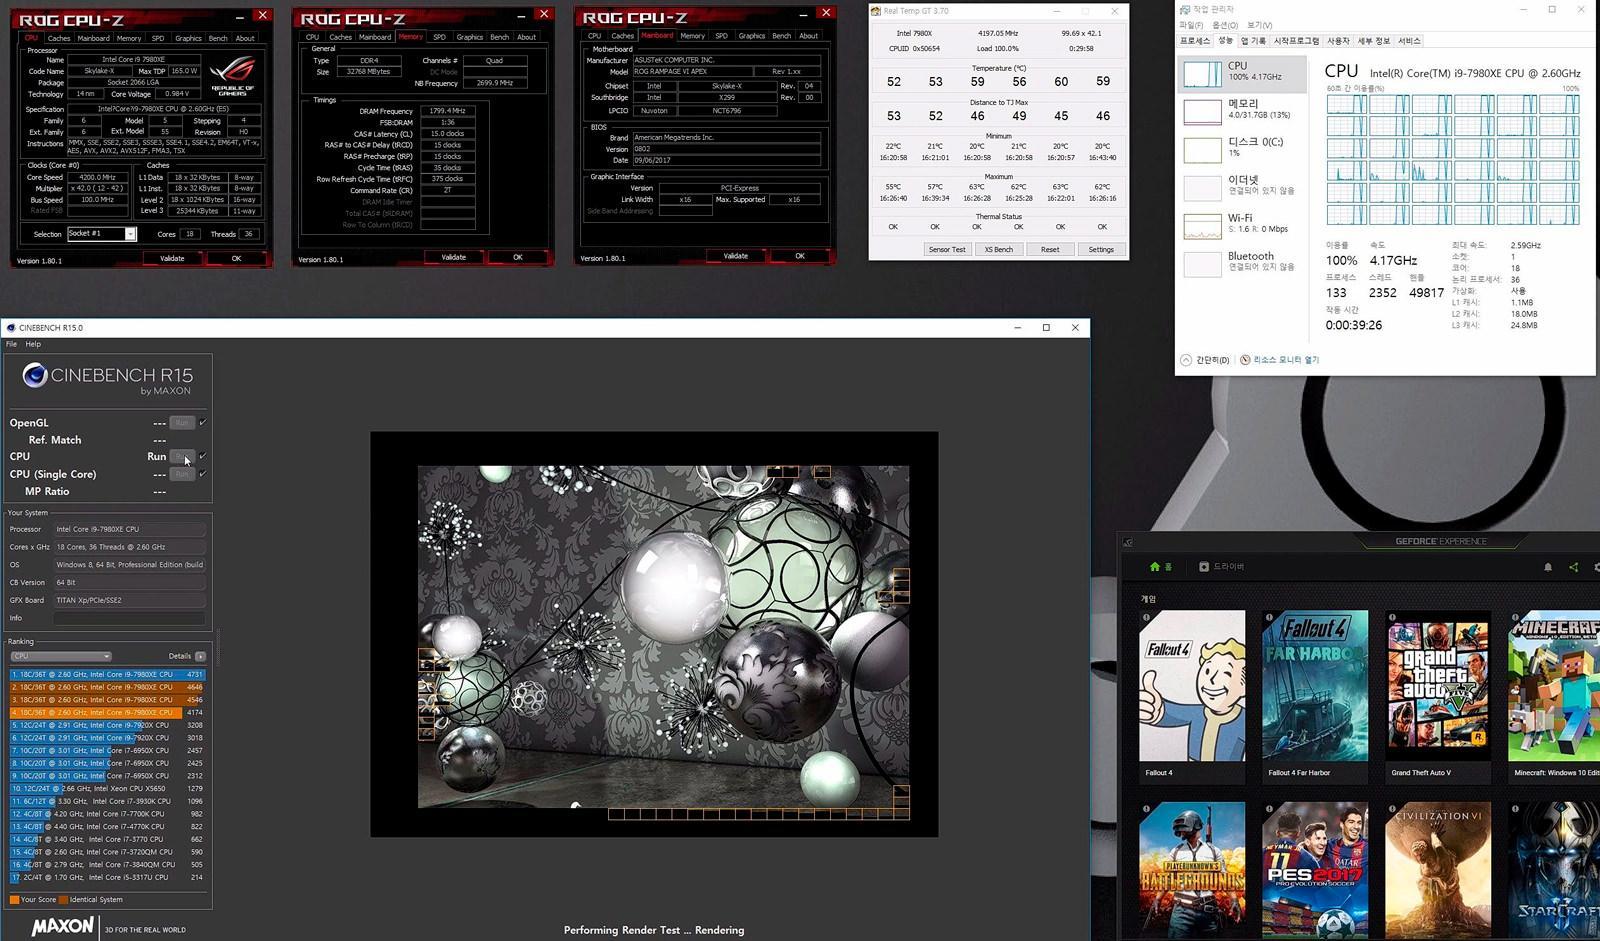 Intel Core i9 7980XE tests 2